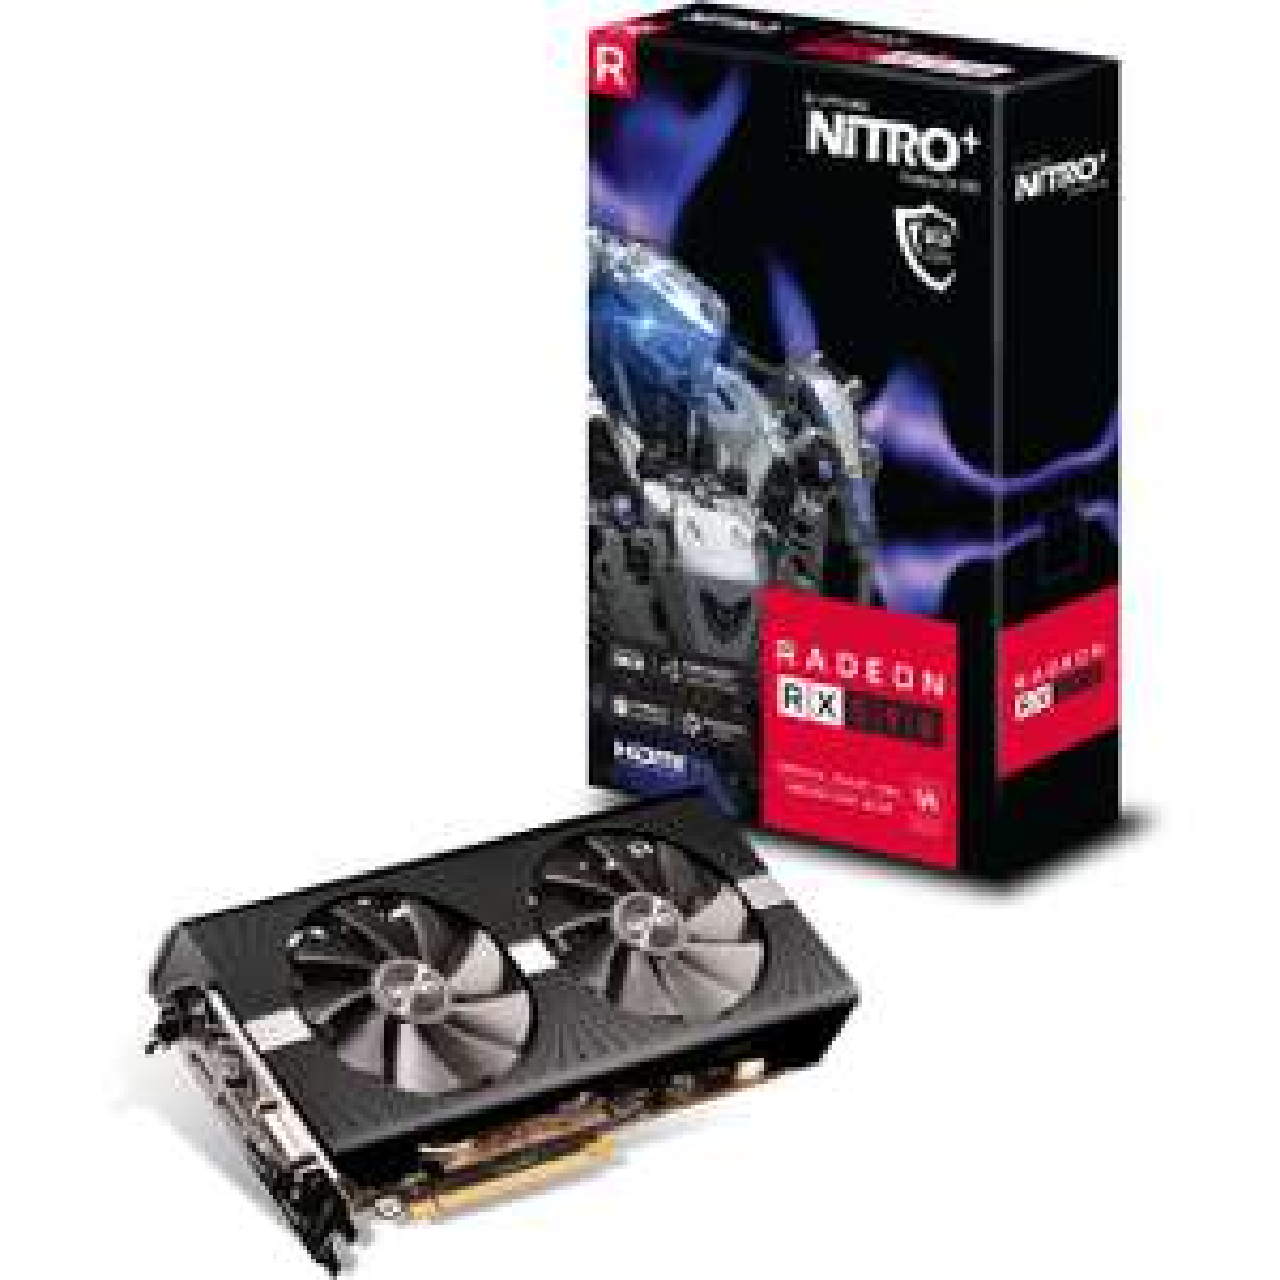 Sapphire Nitro+ Radeon RX 590 8GD5 8GB GDDR5